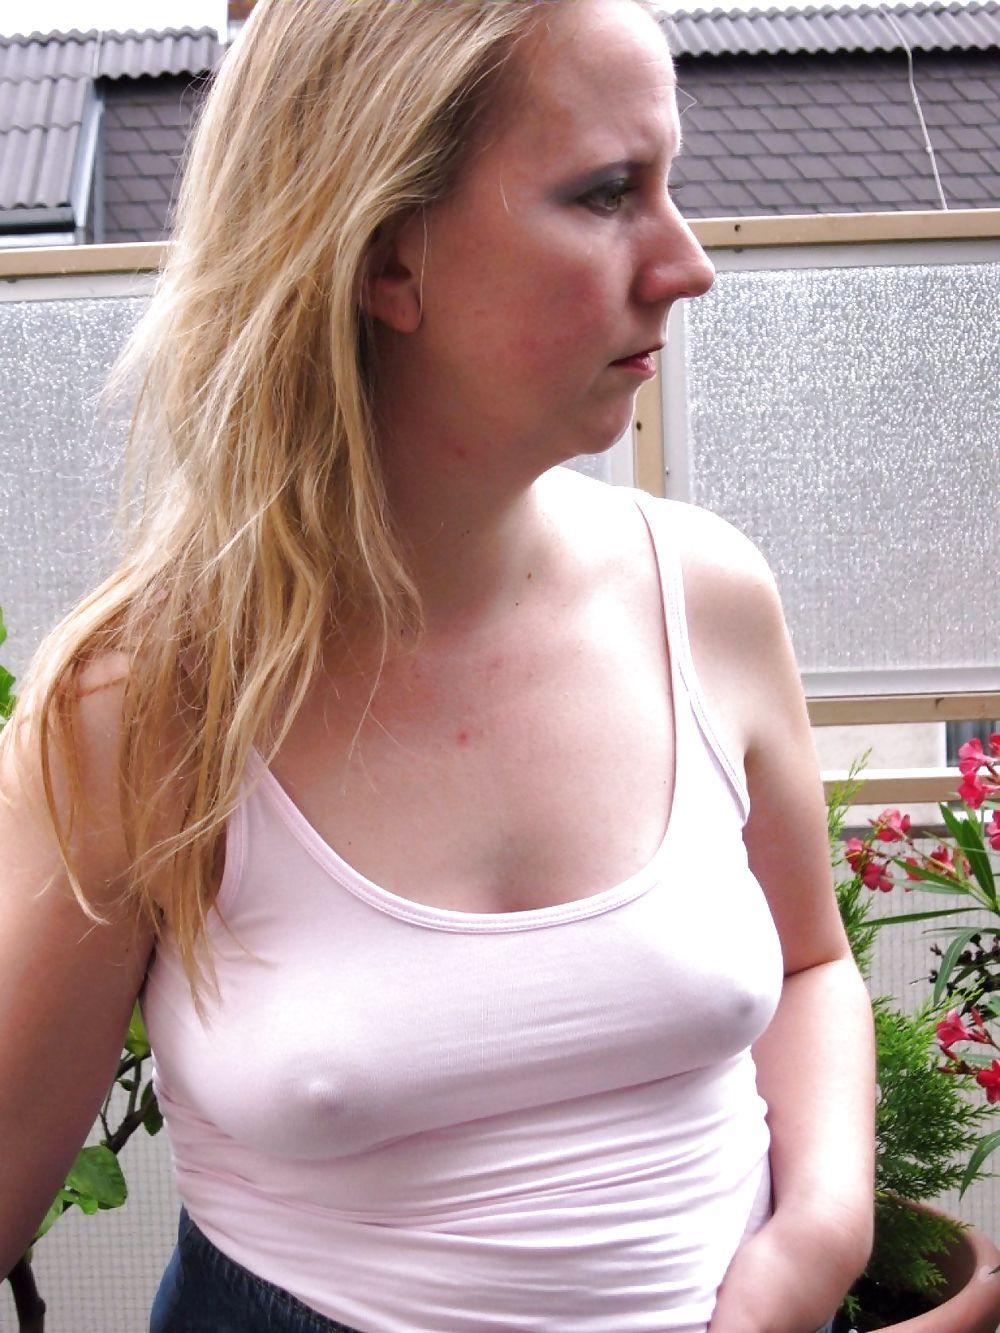 christina ricci totally naked